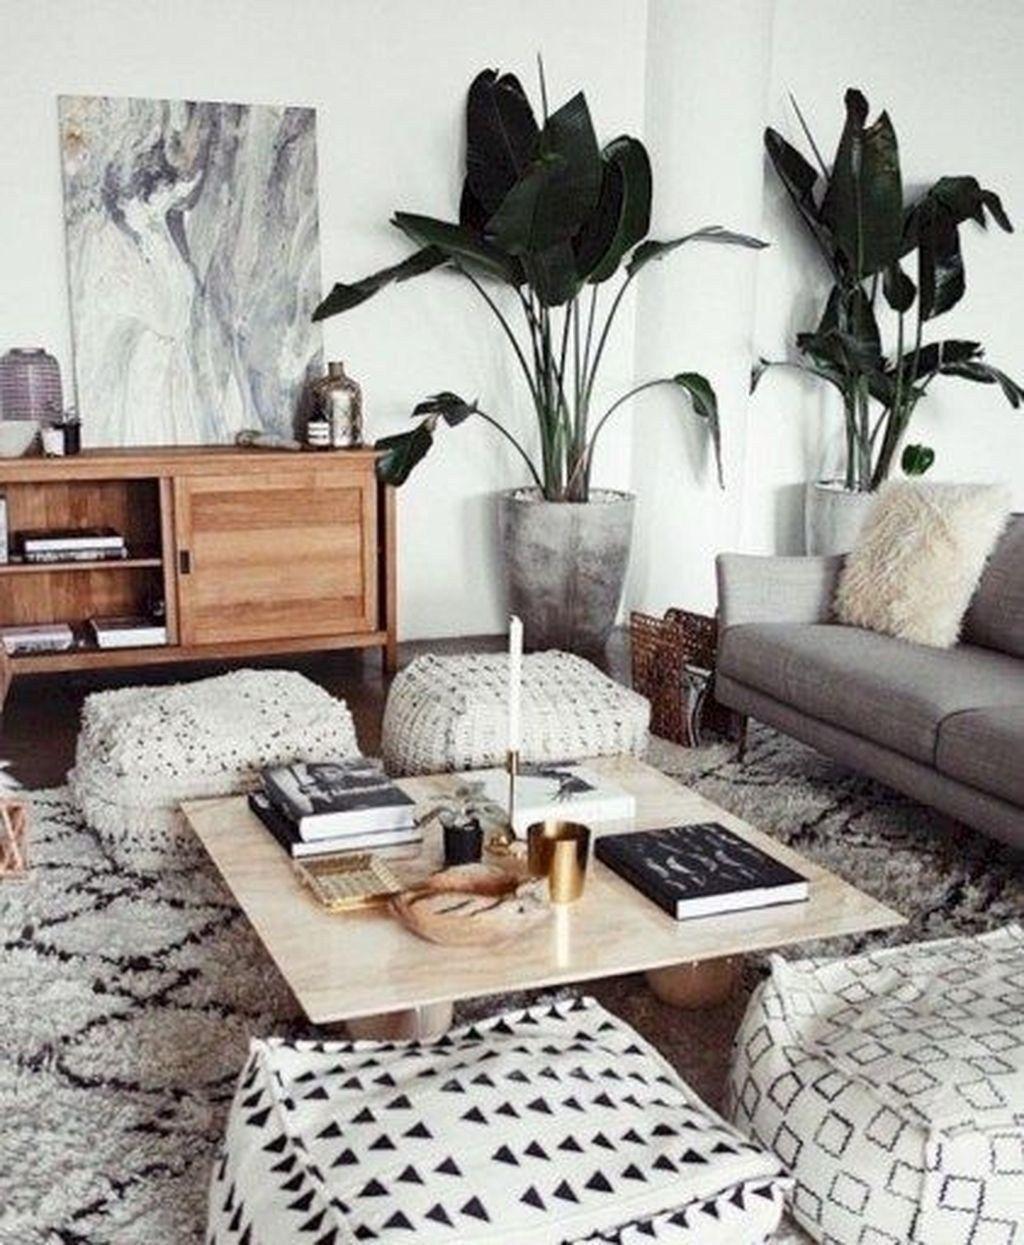 Impressive Interior Design Ideas For Living Room Apartment 27 living #room #impressive #interior #design #ideas #for #living #room #apartment #27